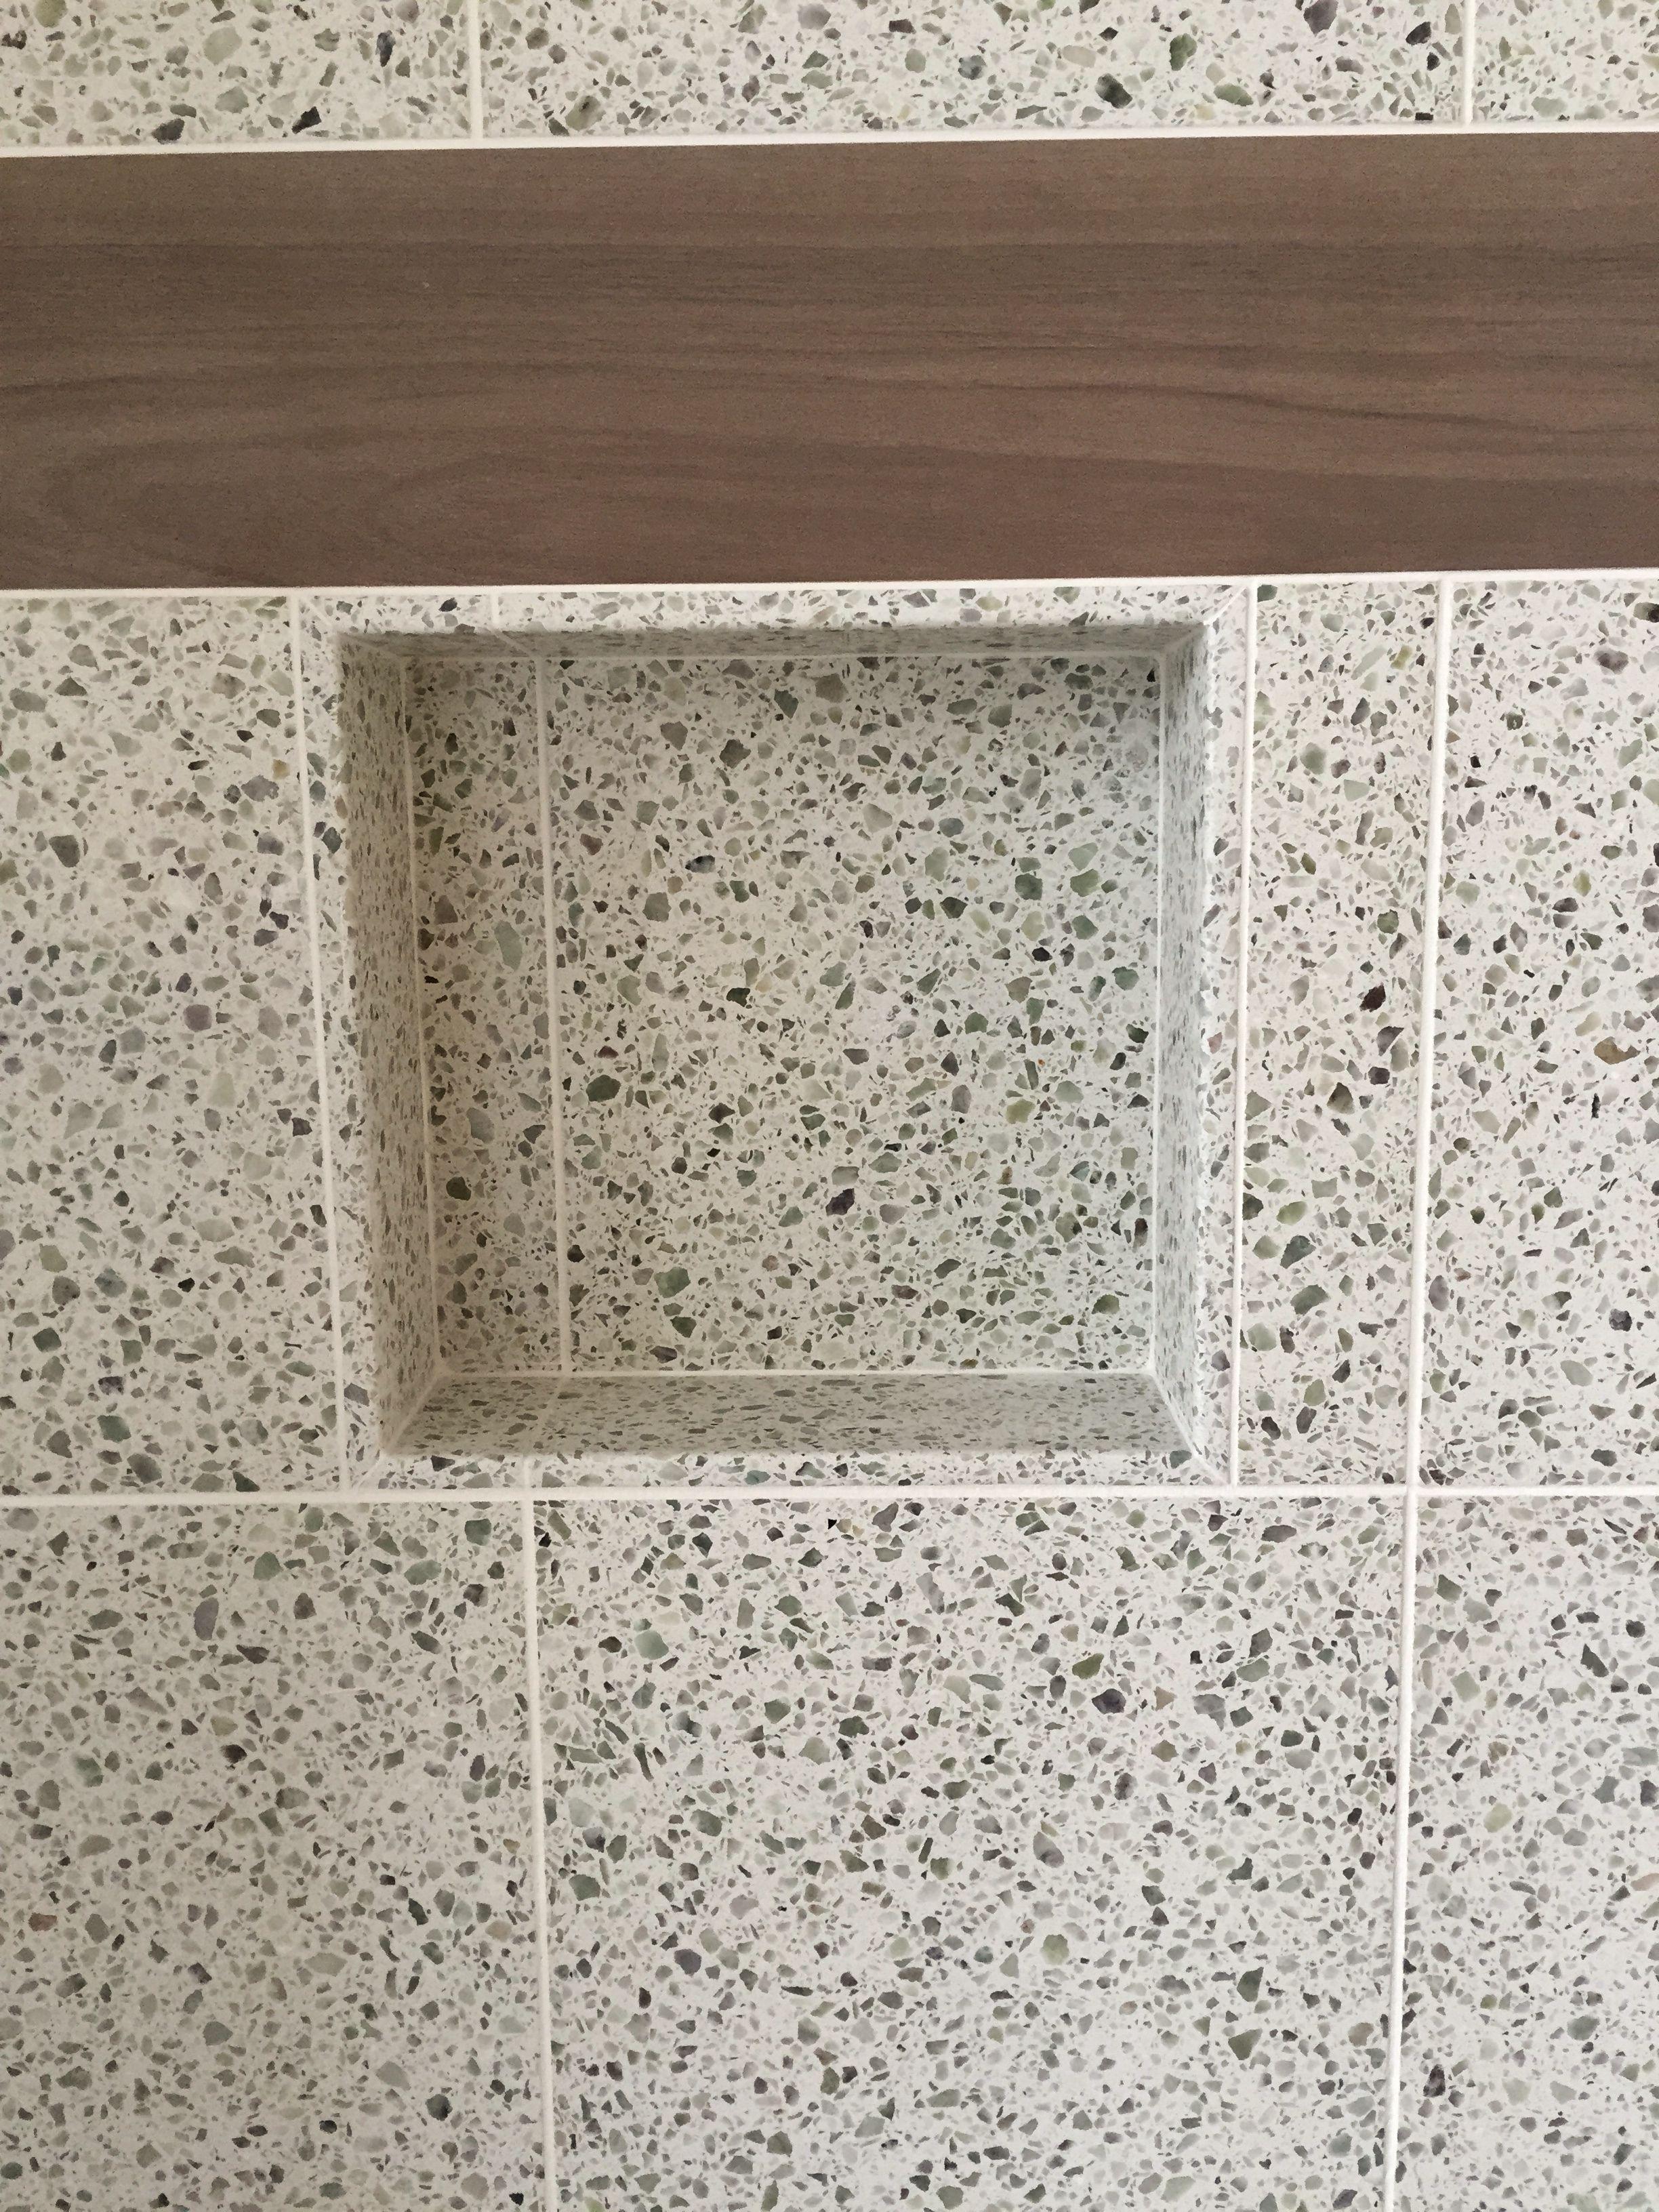 Master shower 12x24 porcelain tile on walls pebbles on floor niche detail at guest shower 12x12 terrazzo tile with porcelain plank accent doublecrazyfo Images